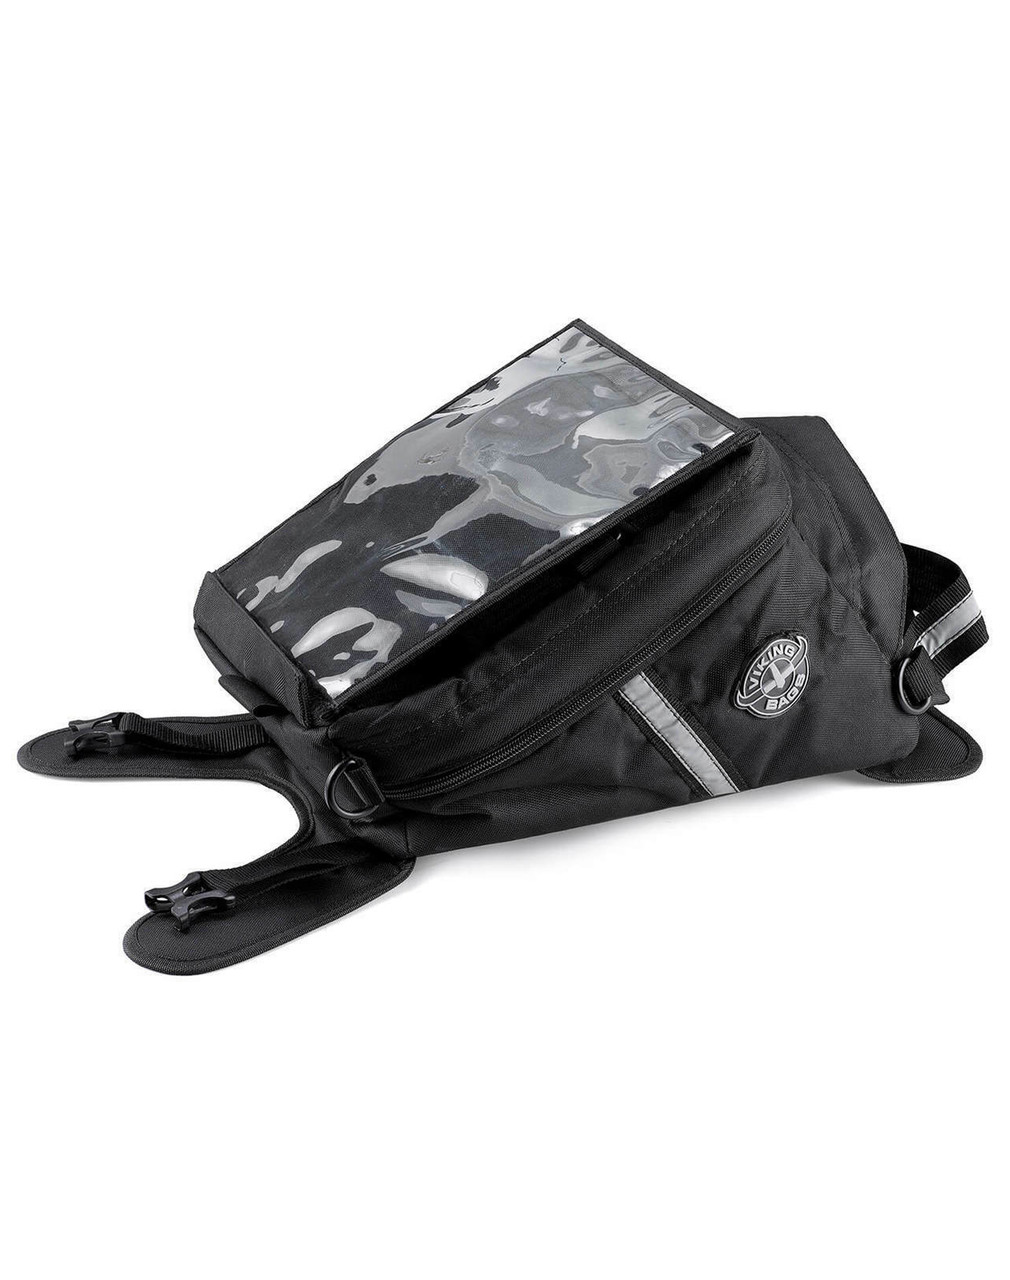 Viking Dirtman Medium Black Victory Motorcycle Tank Bag Main Bag View